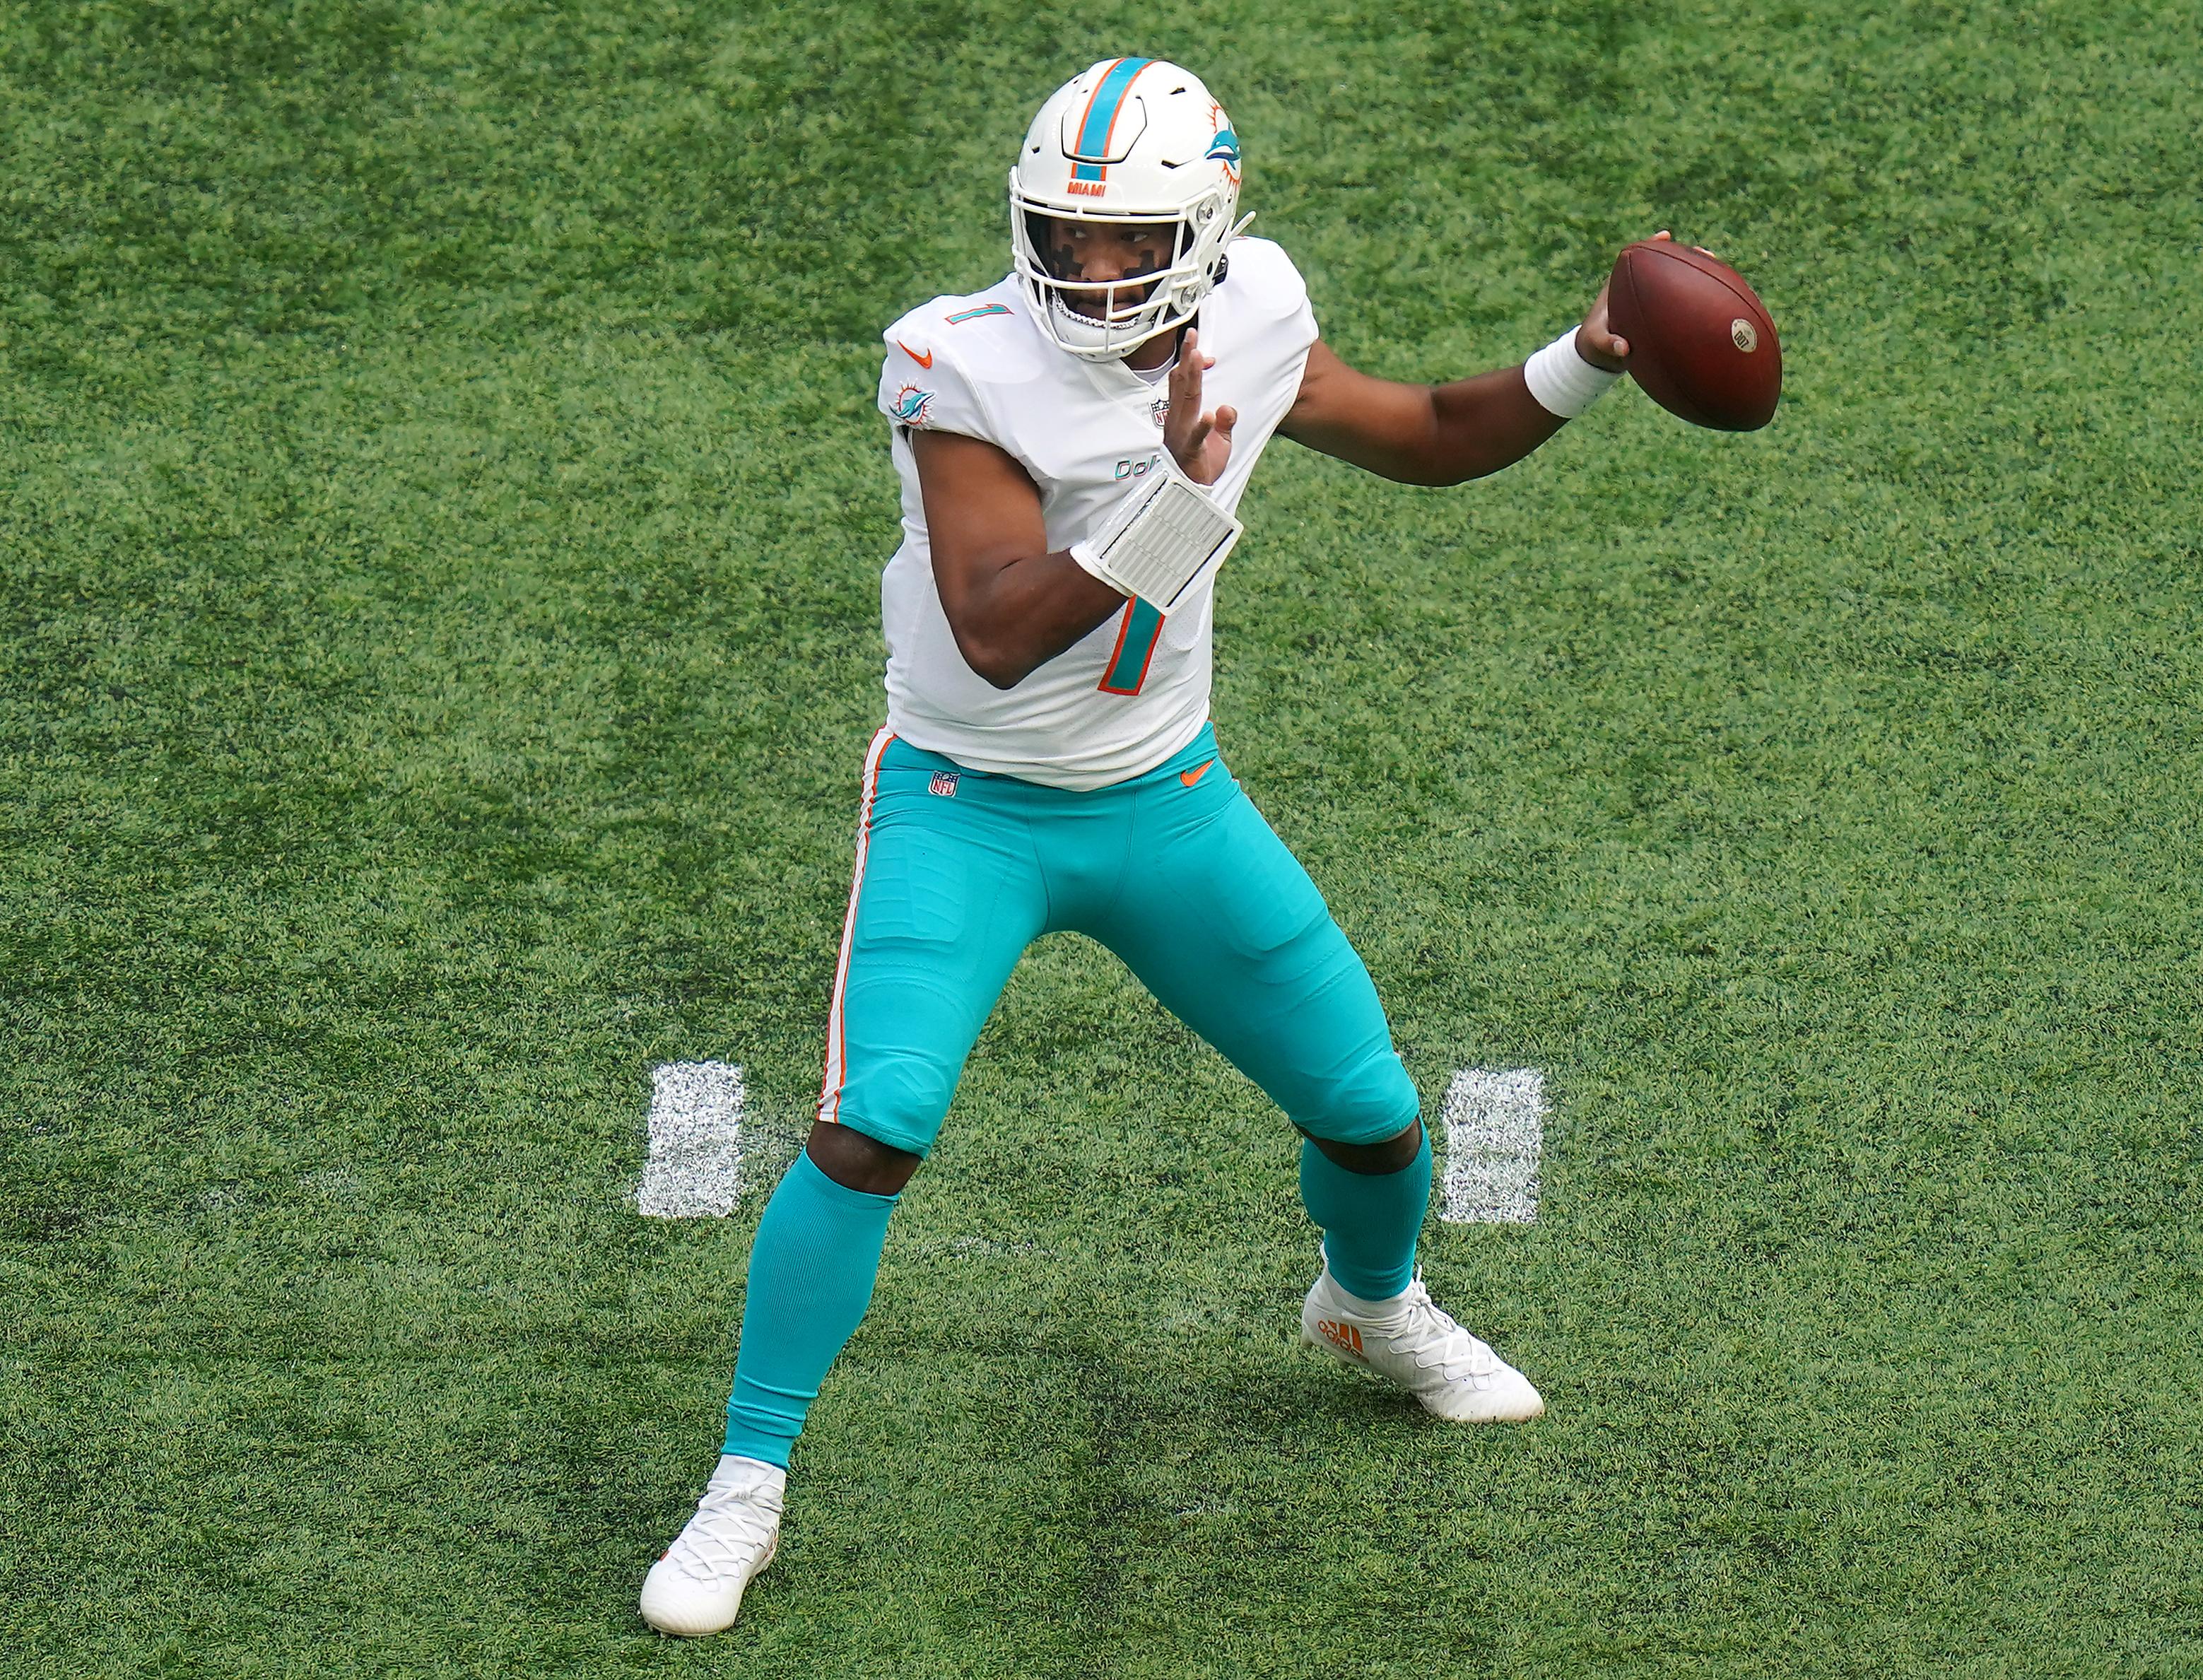 Jacksonville Jaguars v Miami Dolphins - NFL London Games 2021 - Tottenham Hotspur Stadium